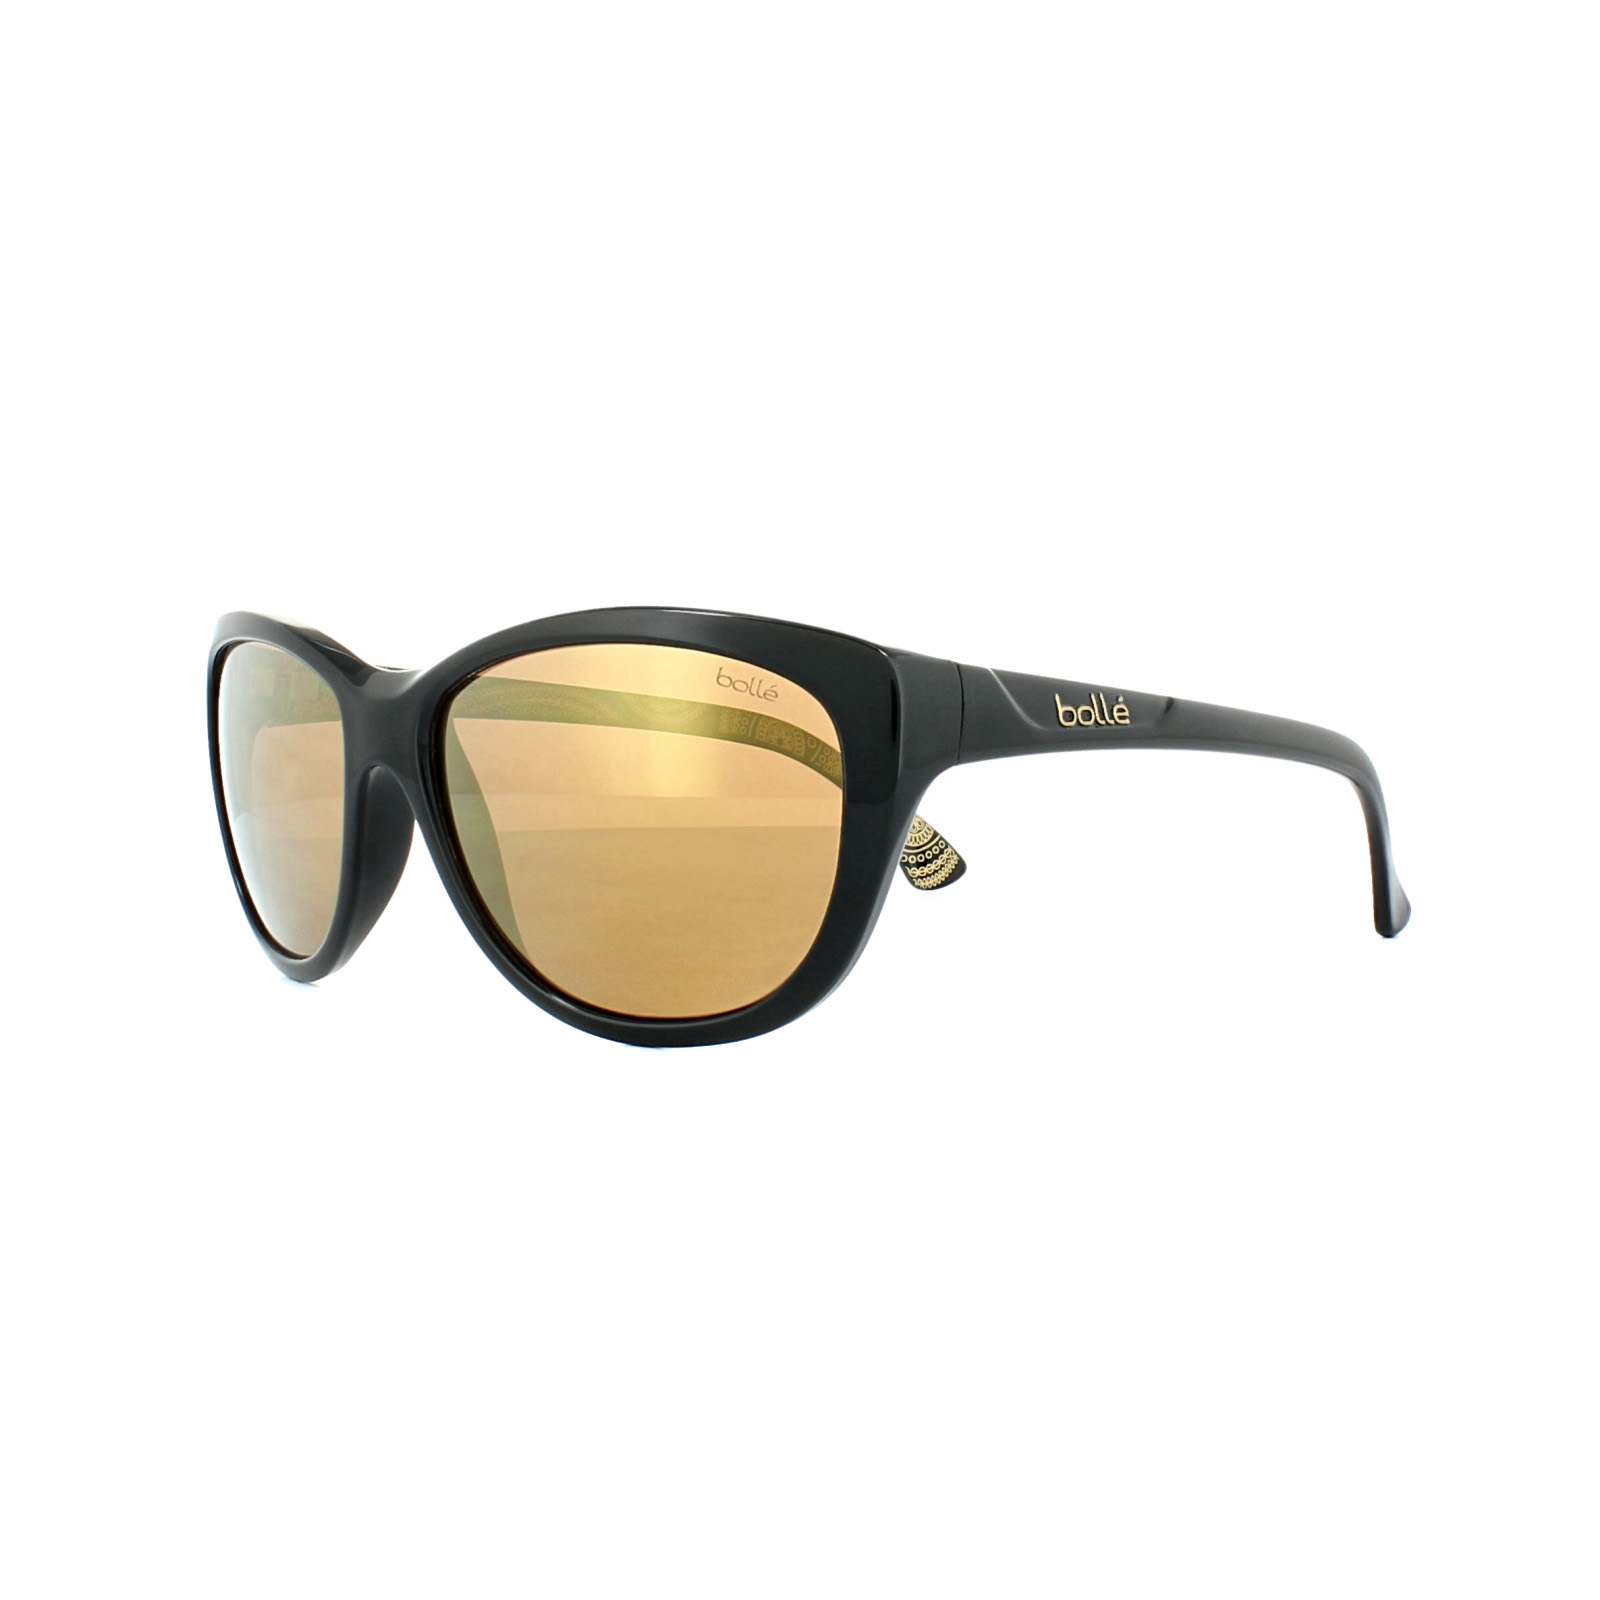 832005456b Sentinel Thumbnail 1. Sentinel Bolle Sunglasses Greta 11952 Shiny Black  AG14 Amber Gold Flash Polarized